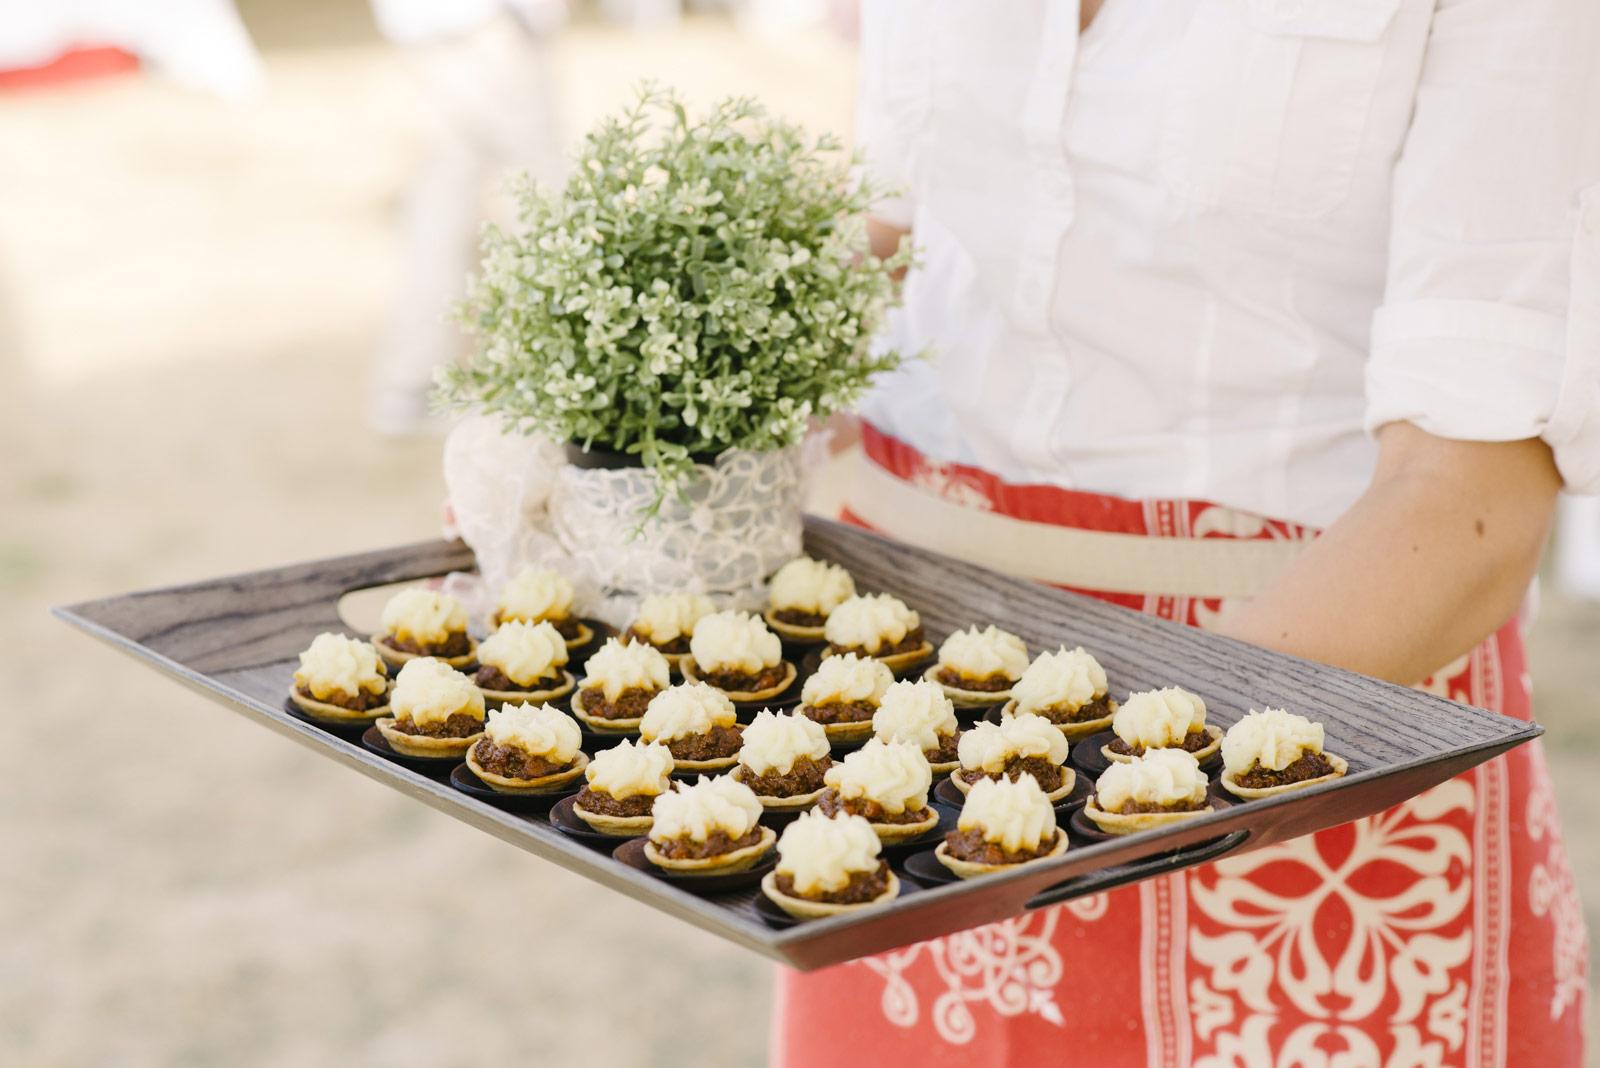 1403richter-363wedding_tasmanian_gormet_kitchen_caroline_dowling_catering_alan_moyle_wedding_tasmania_photography_photobat_clarendon.jpg